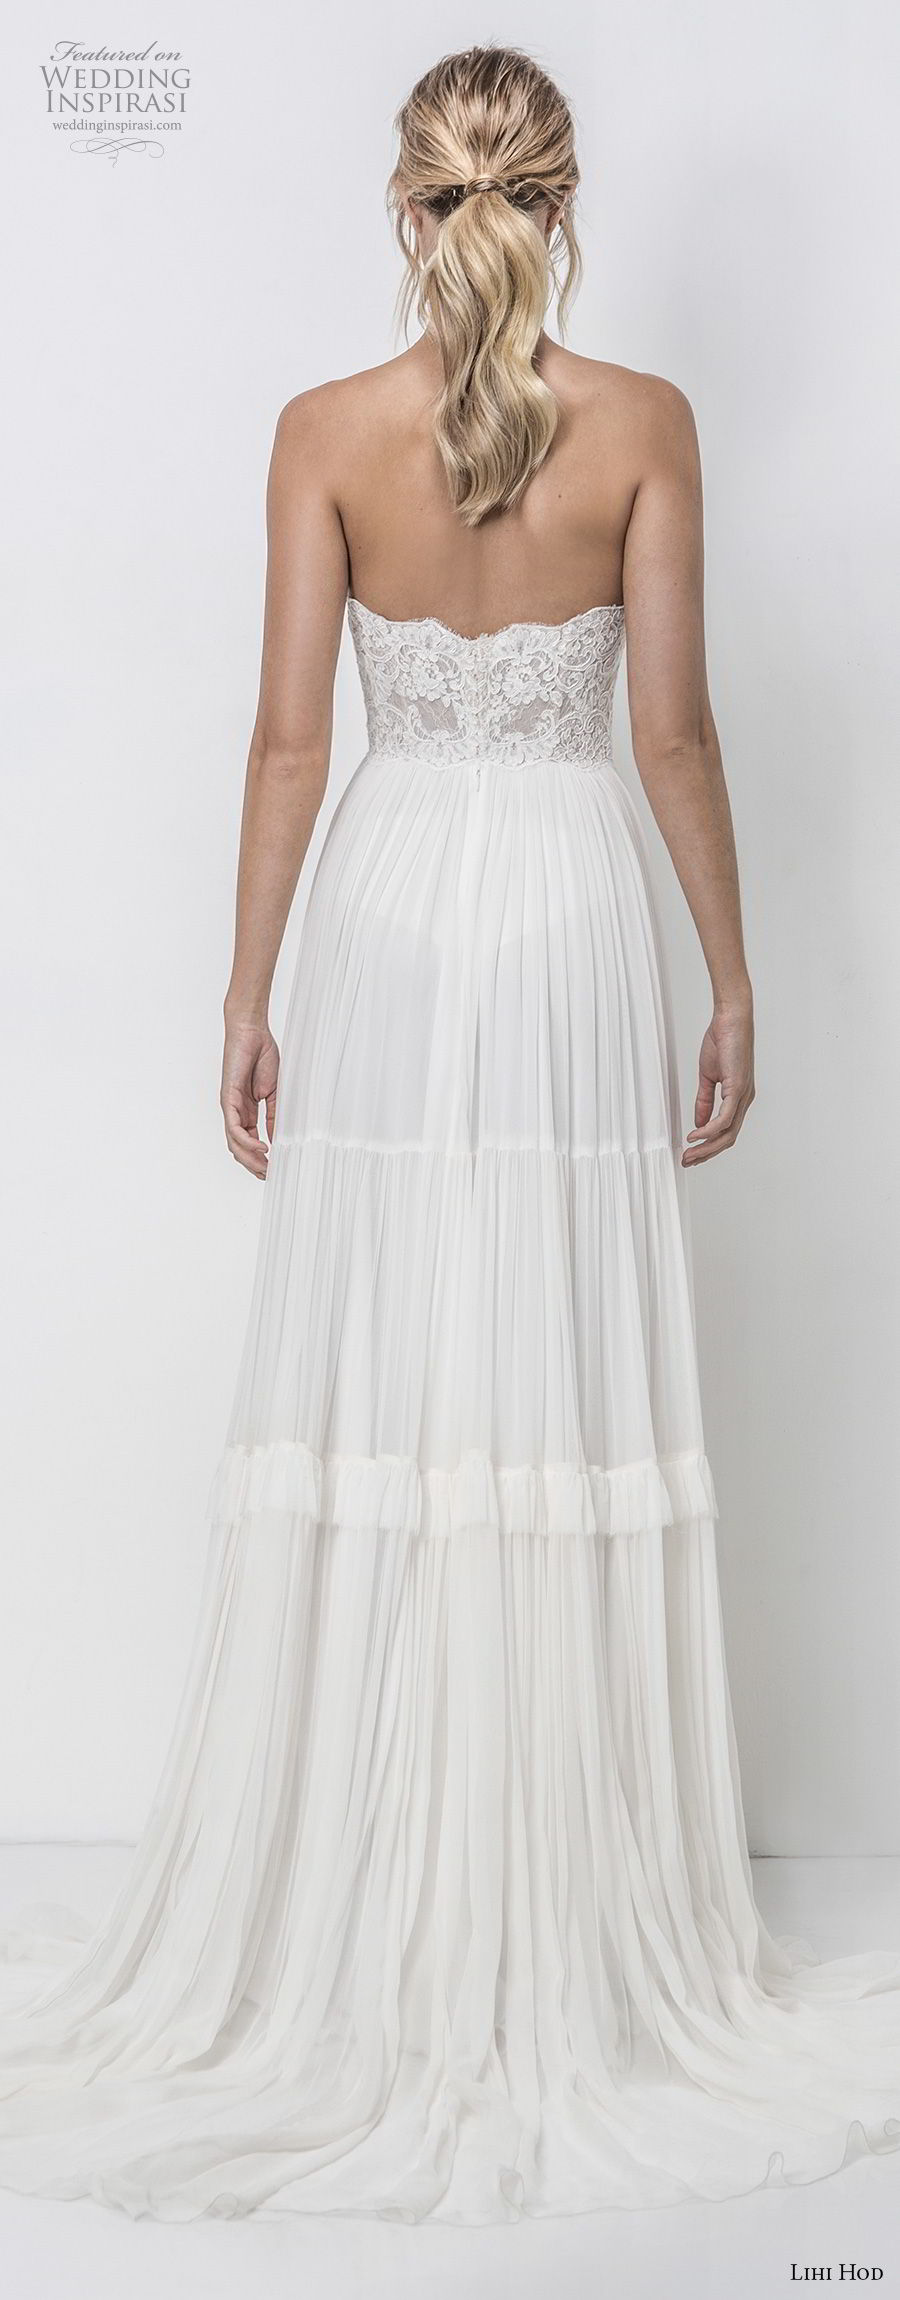 lihi hod 2018 bridal strapless straight across neckline heavily embellished bodice romantic bohemian soft a  line wedding dress medium train (3) bv